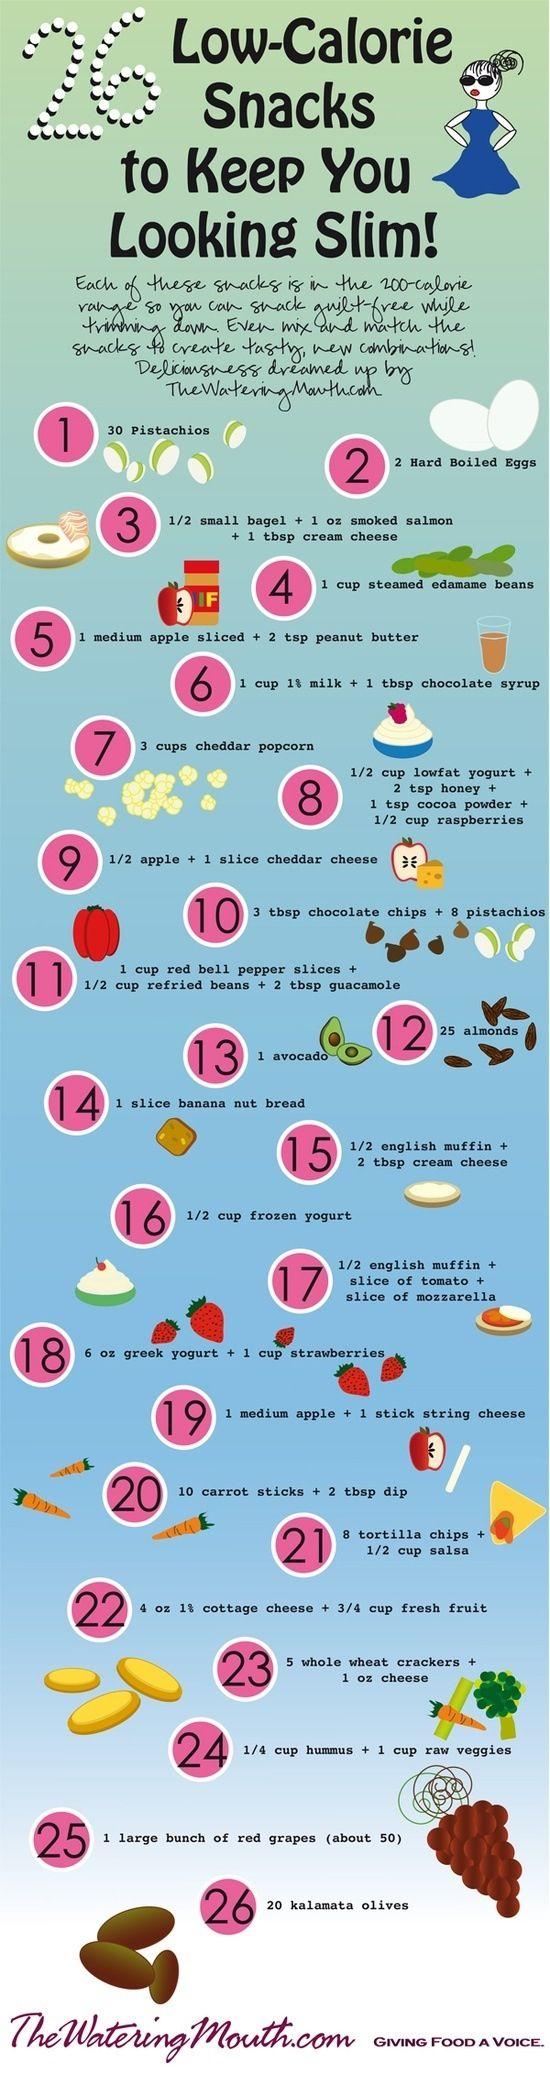 #yougogirl #healthyliving #healthyeating #takenotes #healthyinformation